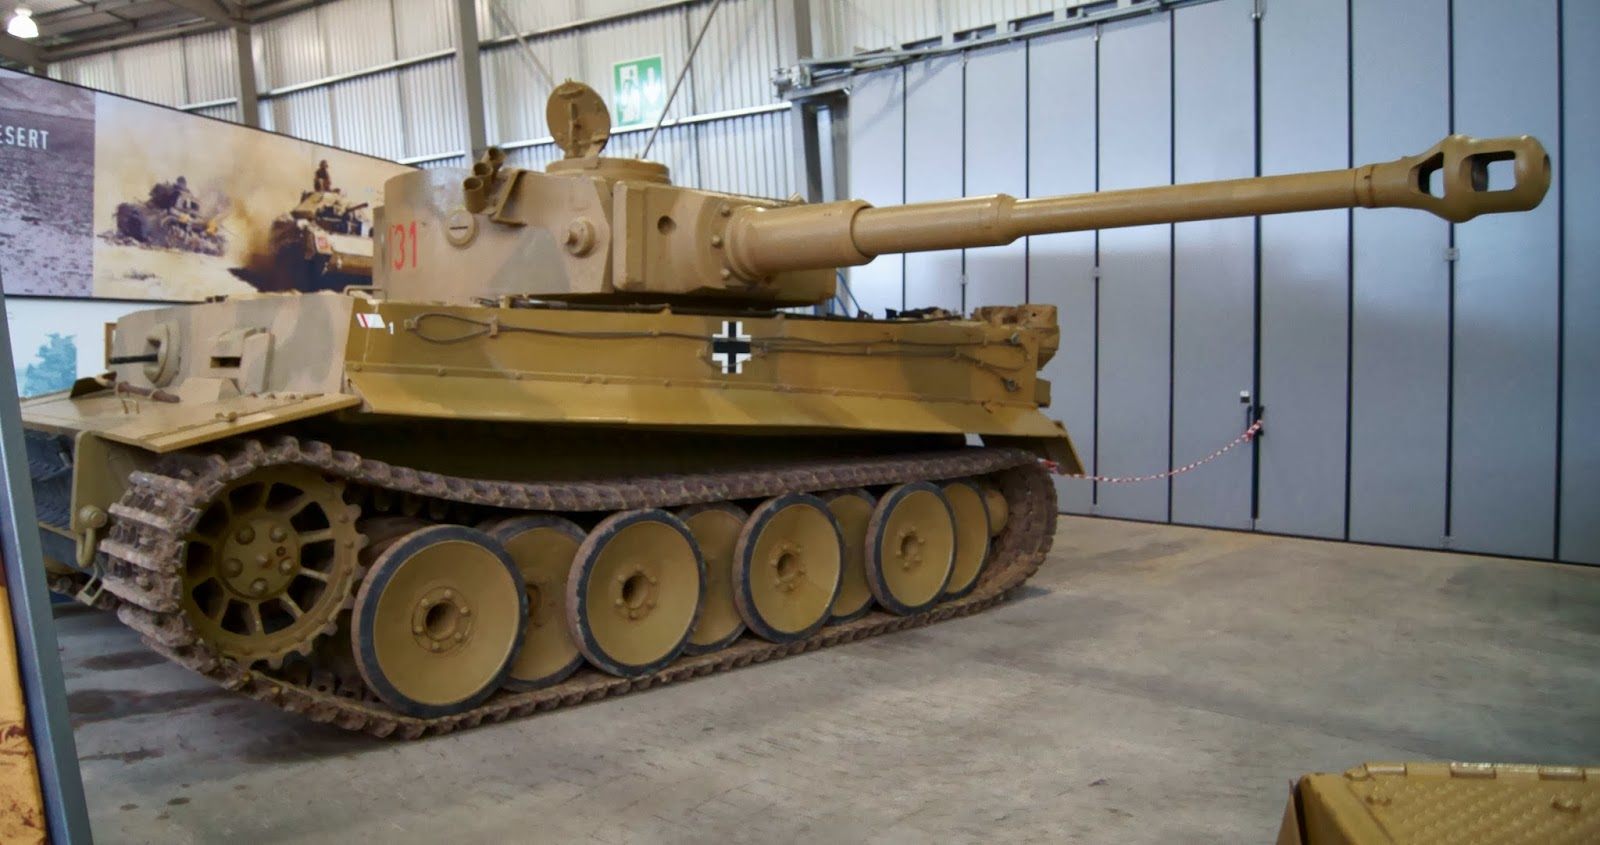 Keith's Wargaming / Painting Blog: Bovington Tank Museum